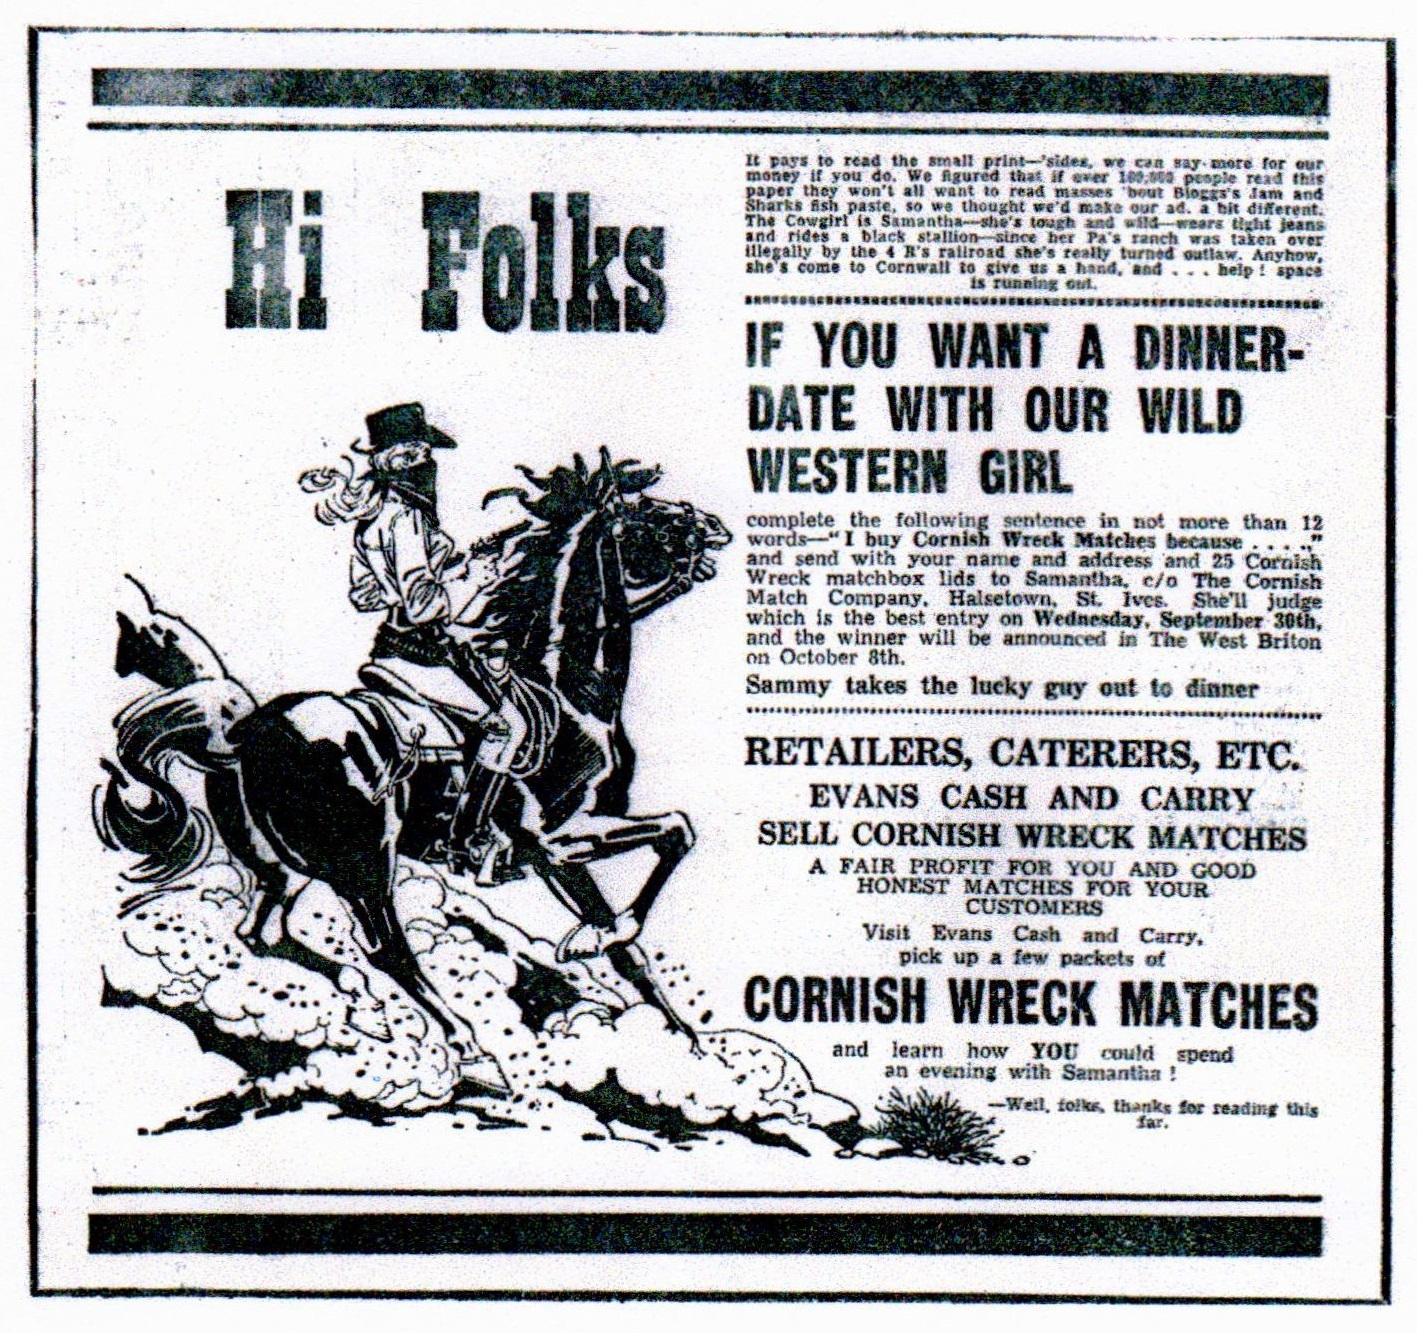 Newspaper advert for Cornish Match, 1970